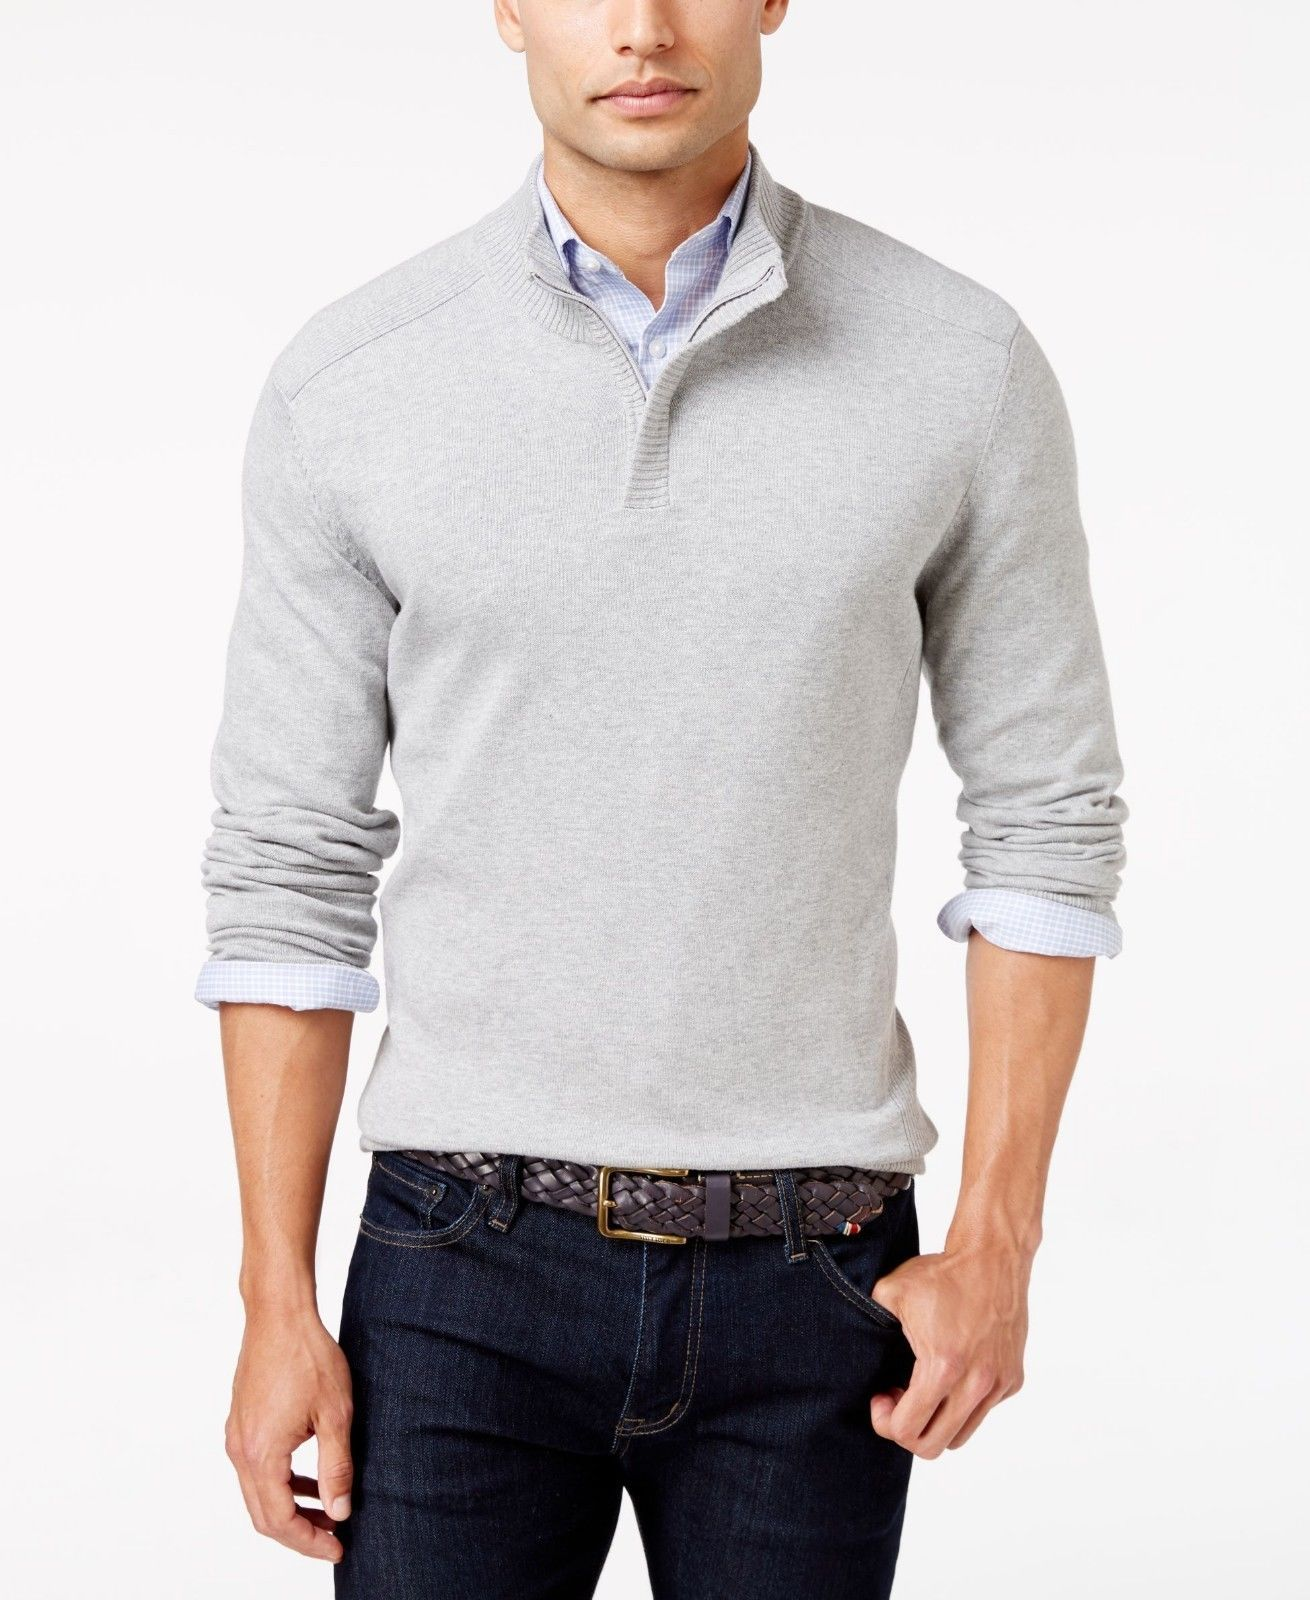 Alfani Men's Marled Sweater Grey Medium